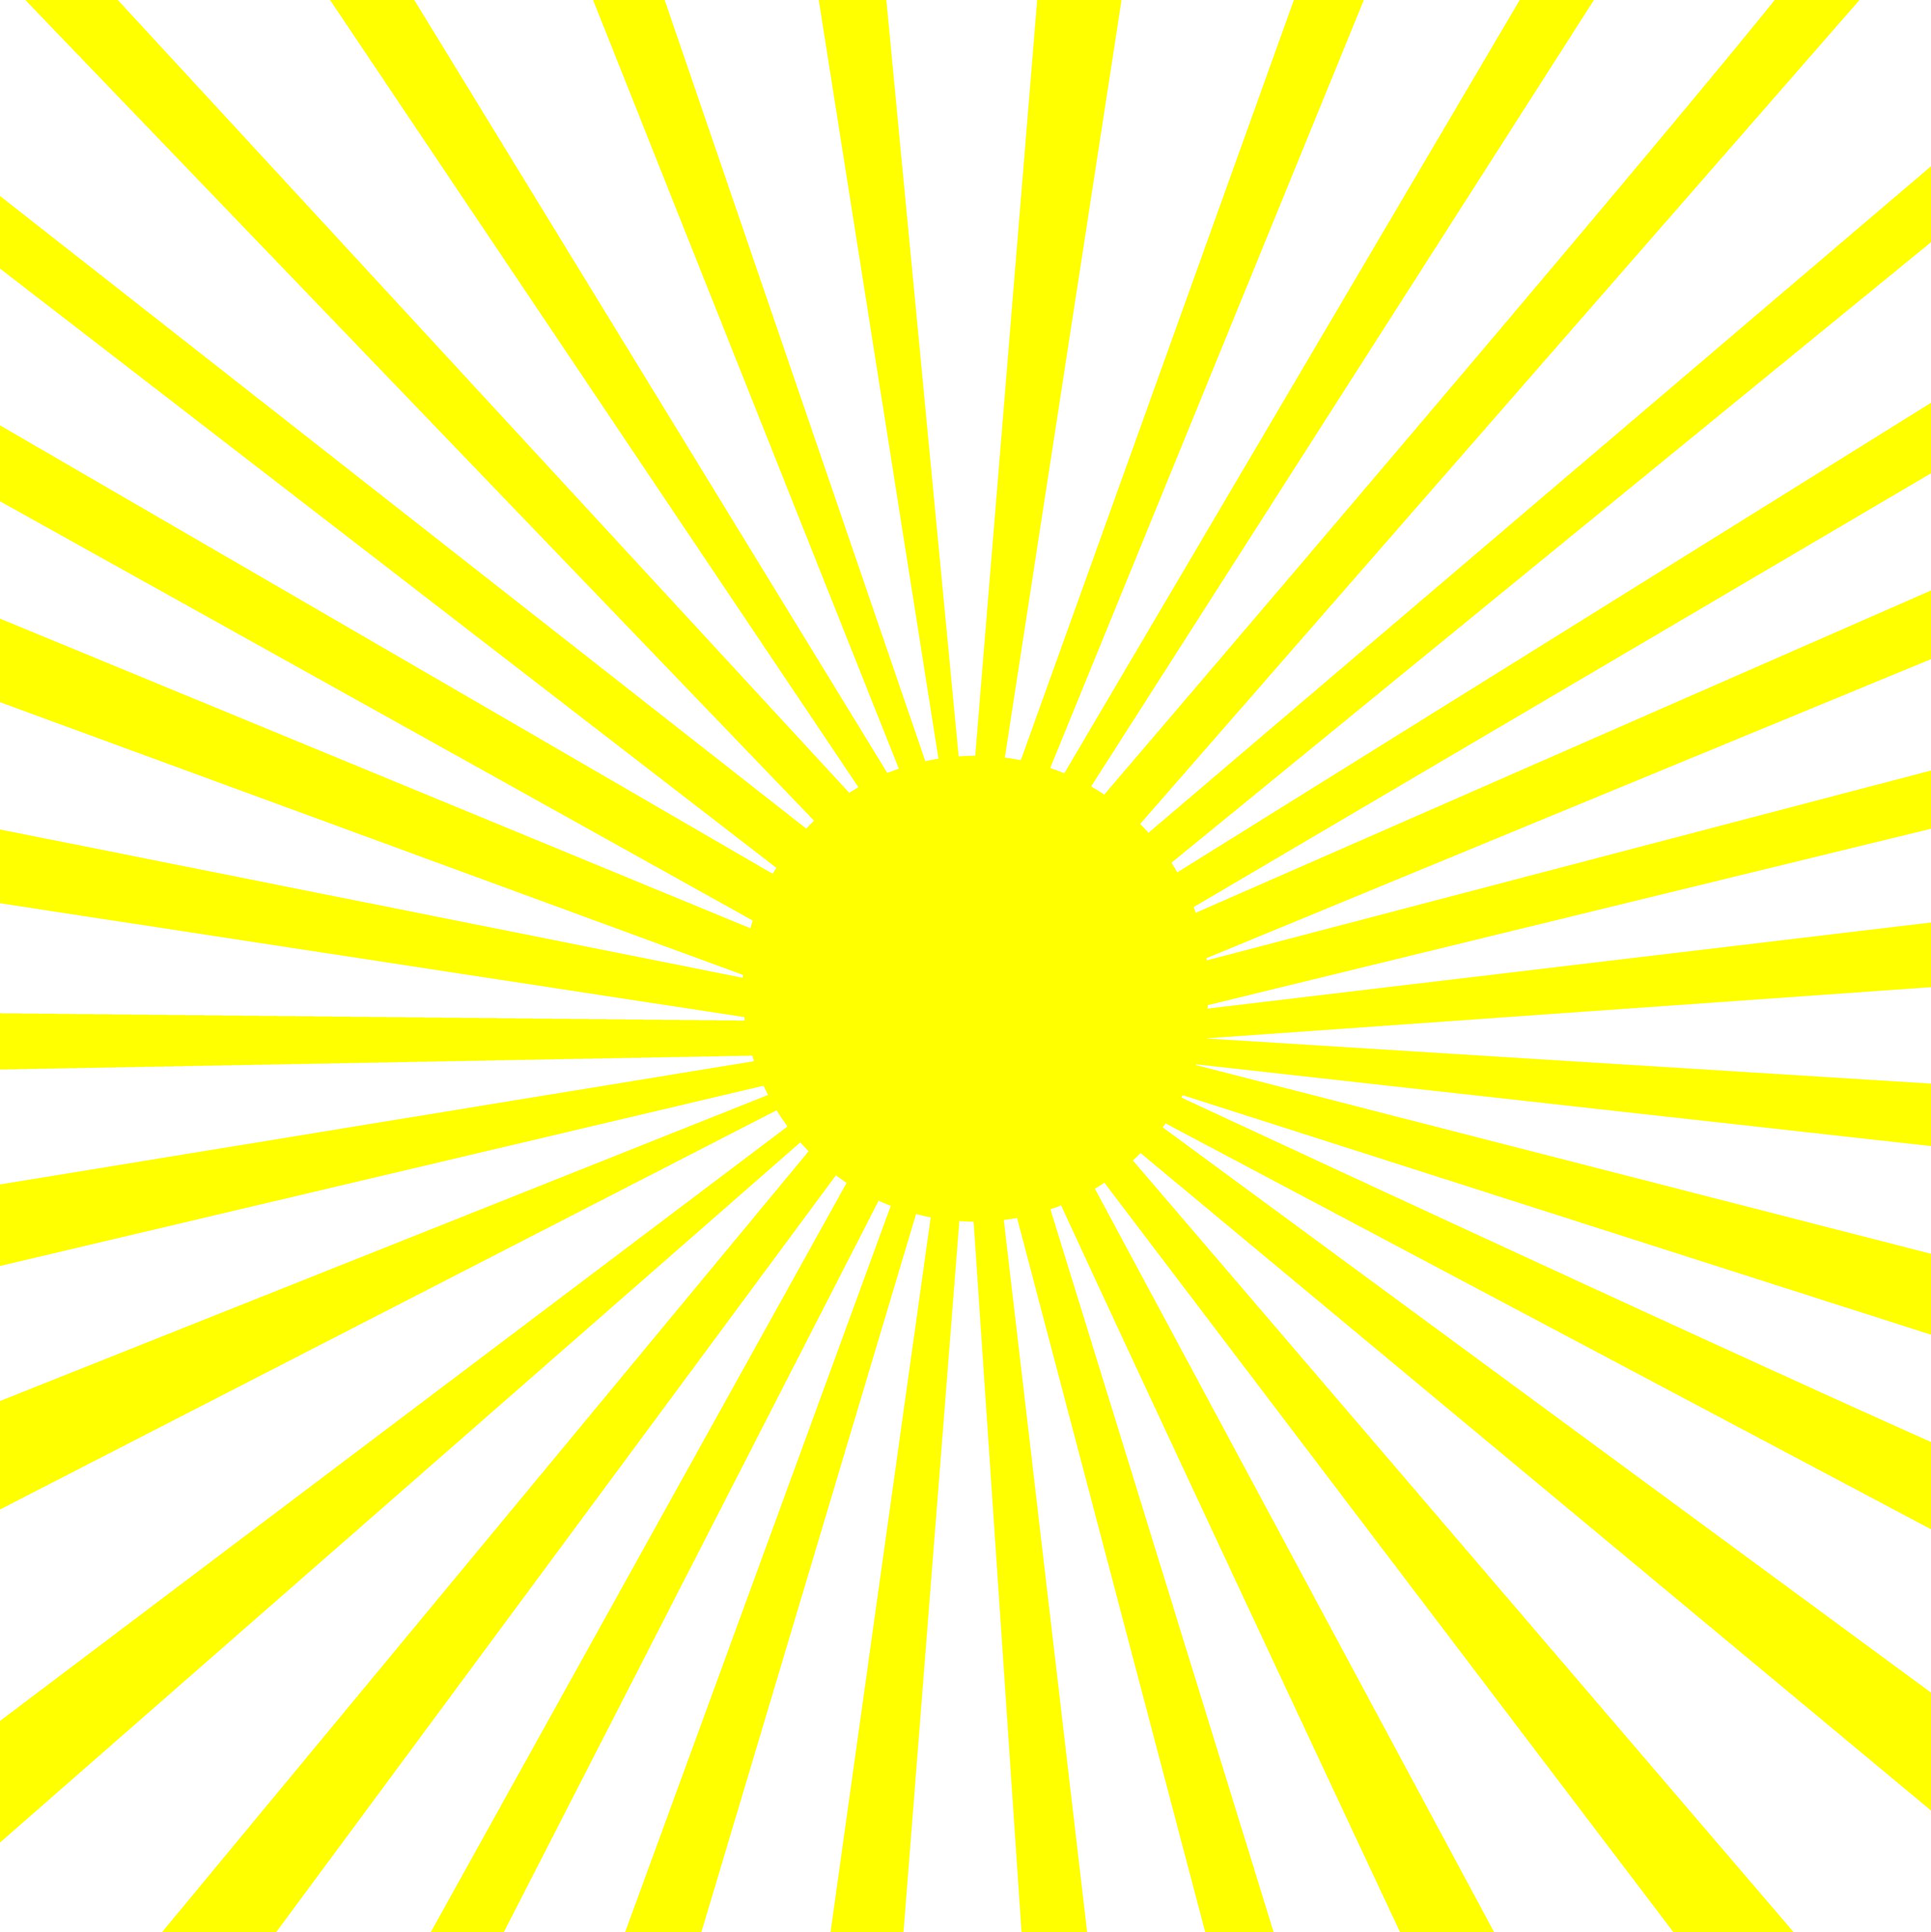 Lineart pattern yellow white. Burst clipart sun burst